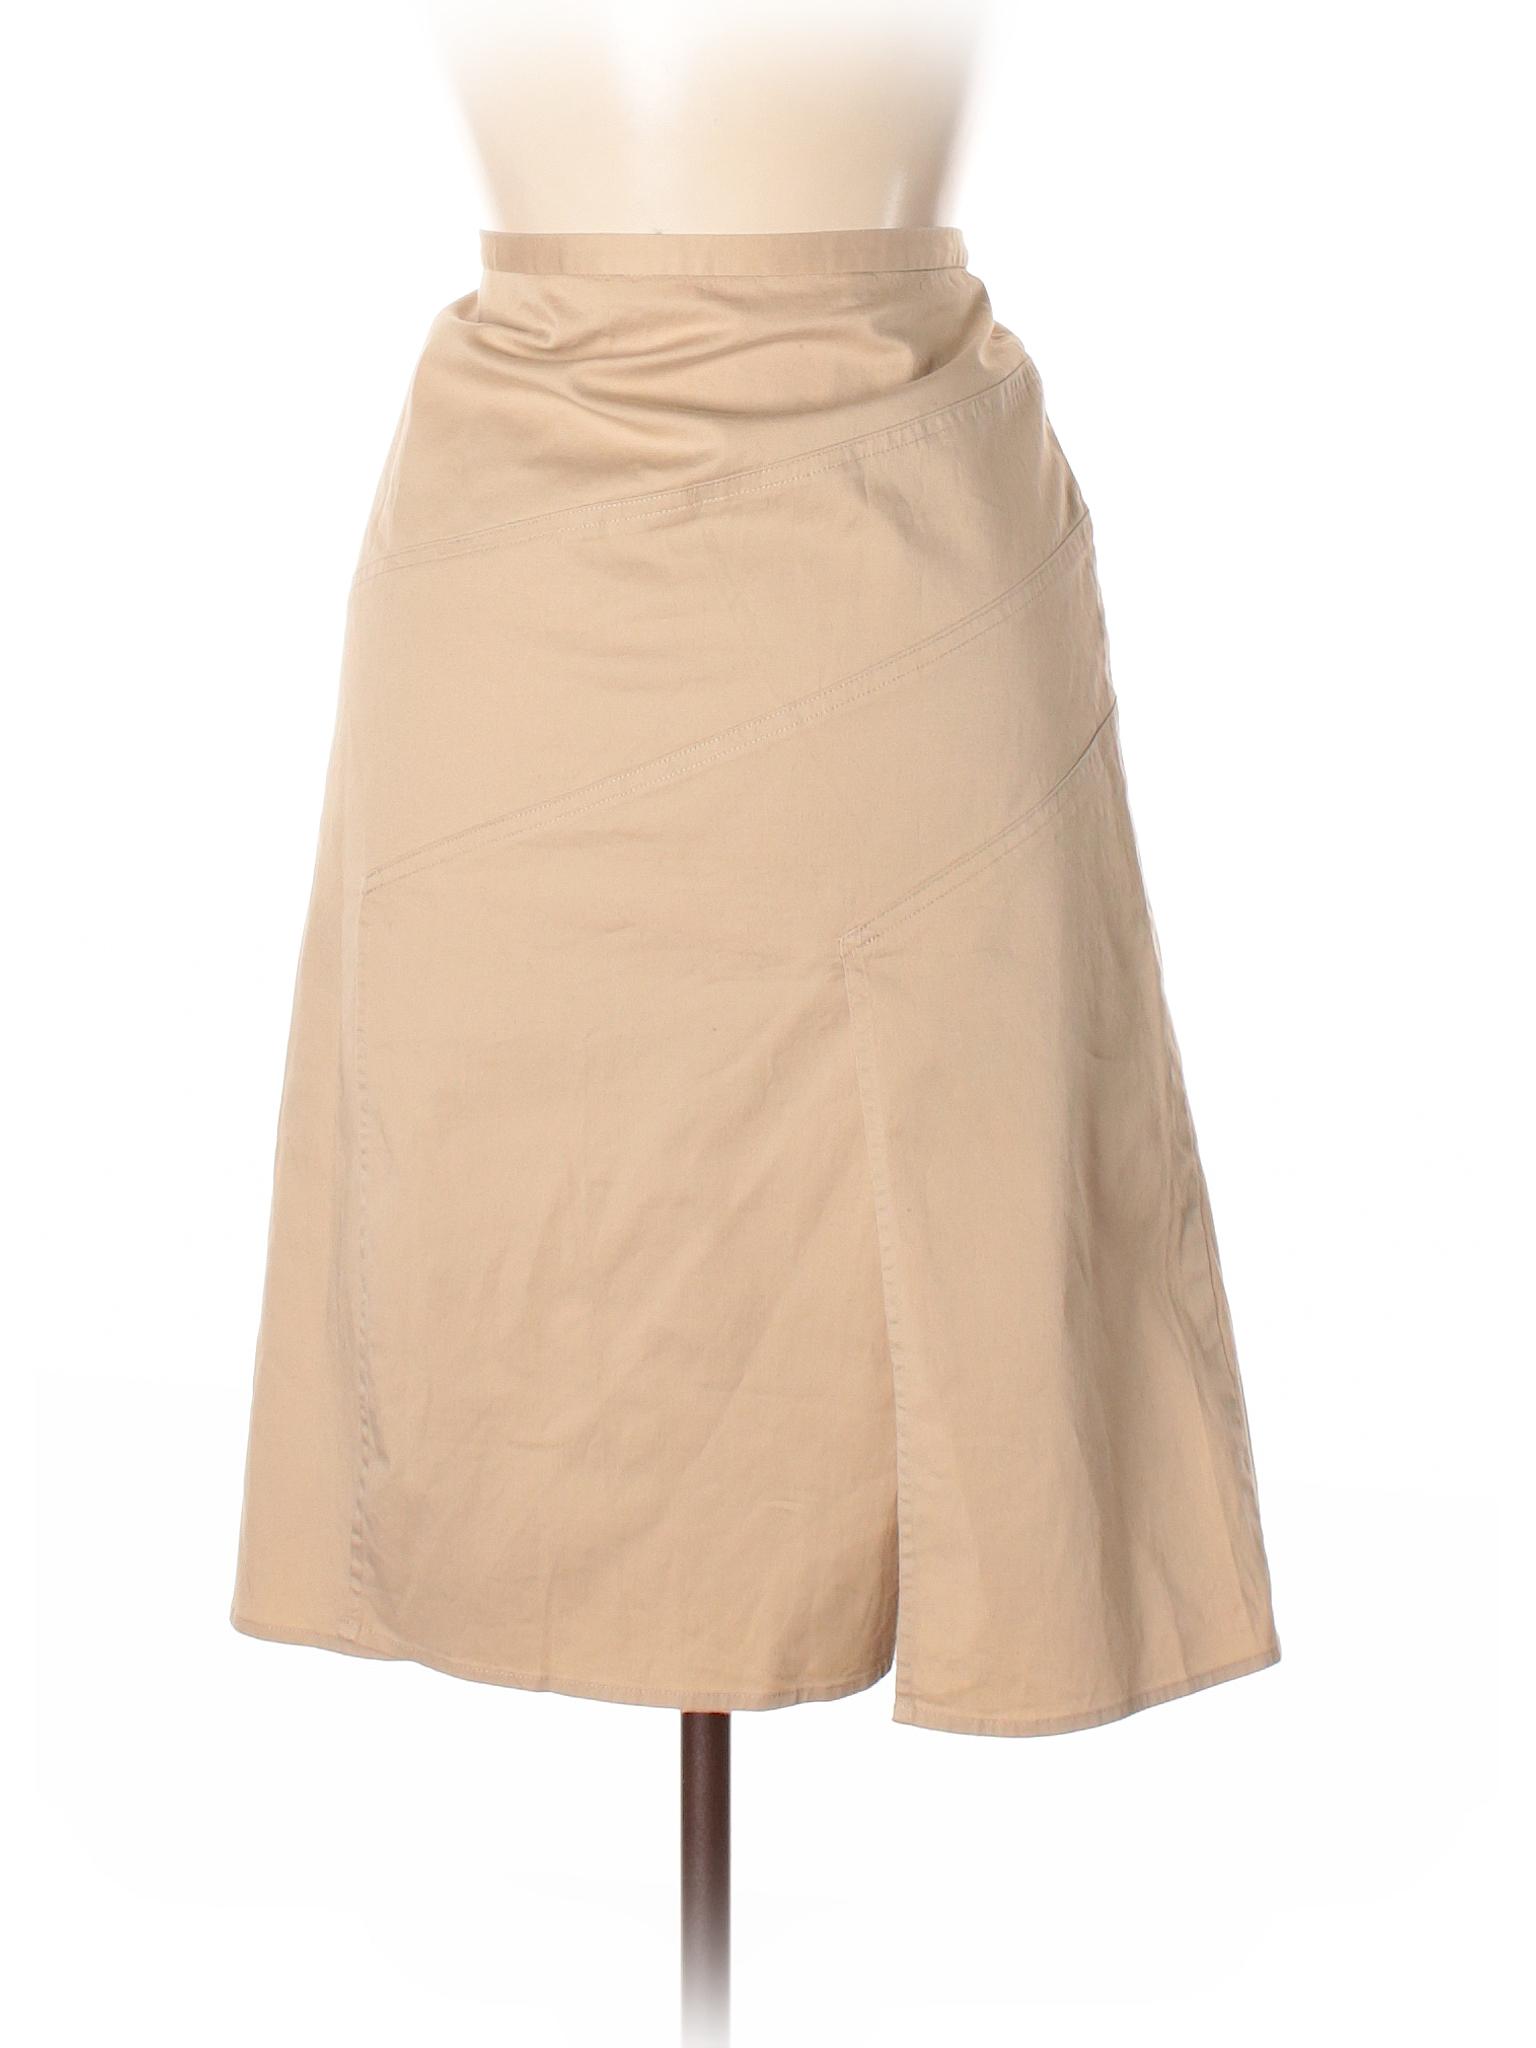 Boutique Skirt leisure Casual BCBGMAXAZRIA Skirt Casual BCBGMAXAZRIA leisure Boutique rA76r8qf